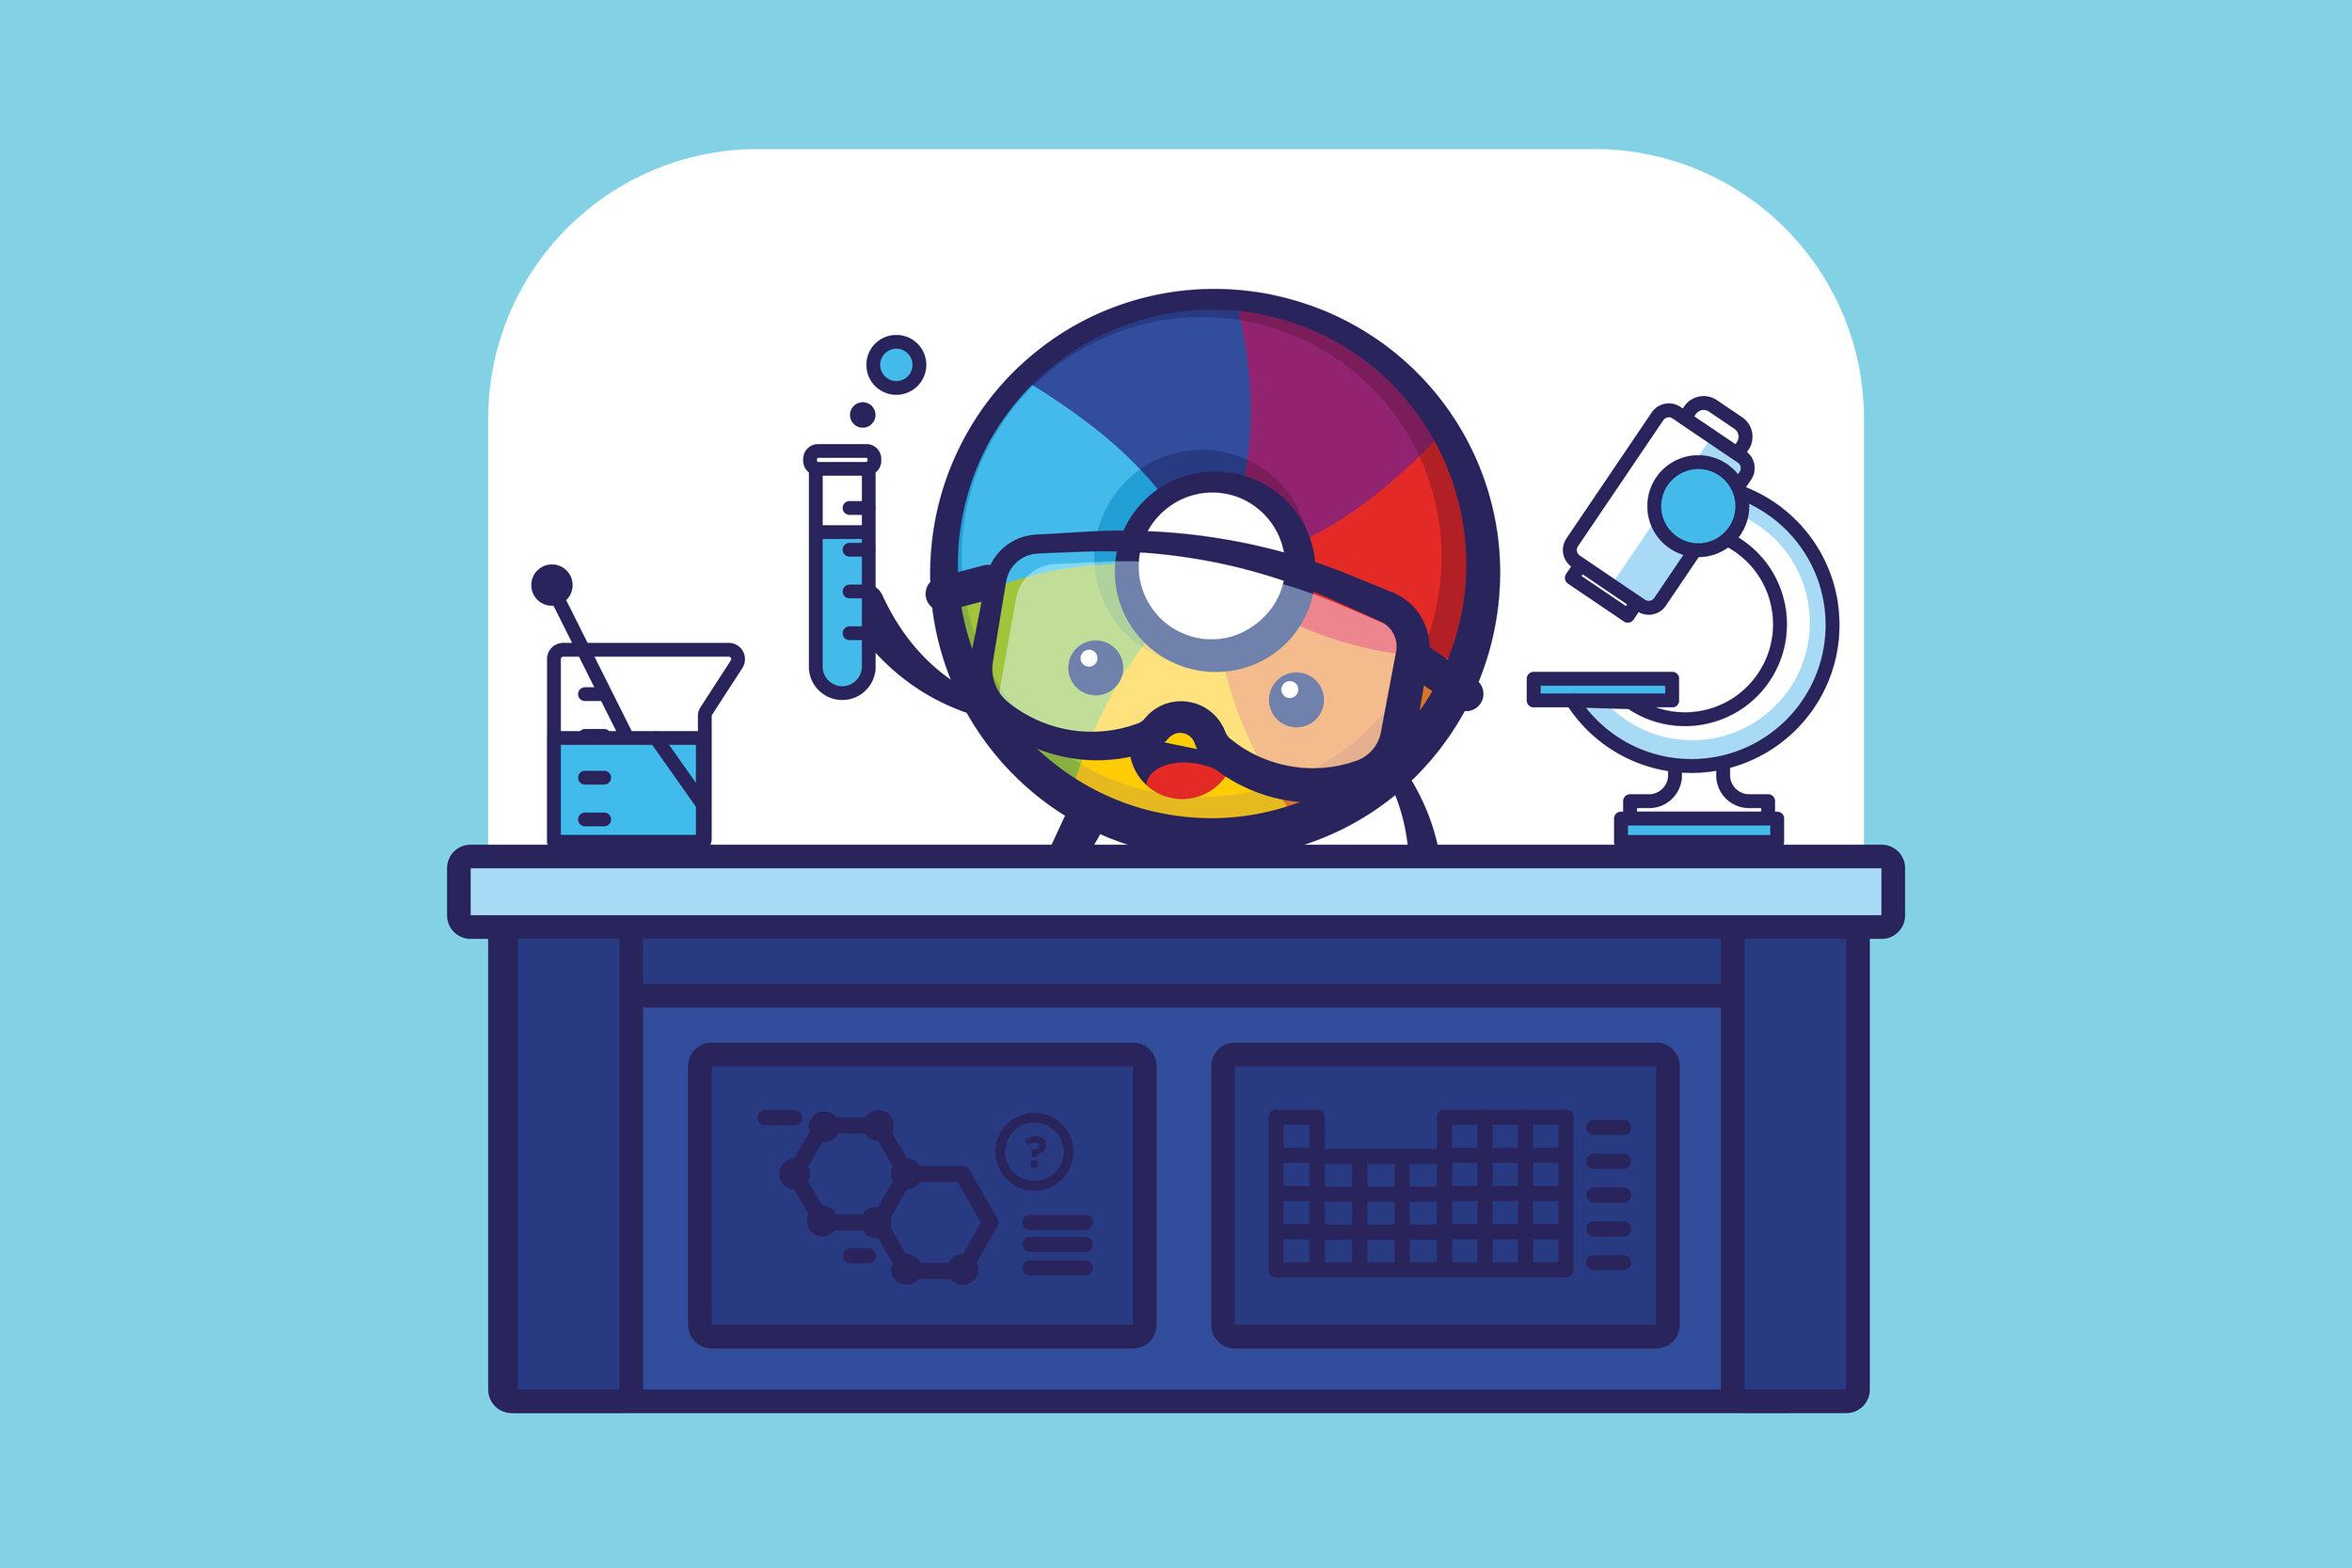 Altmetric_Character_Scenes_R3_v1_lab.jpg